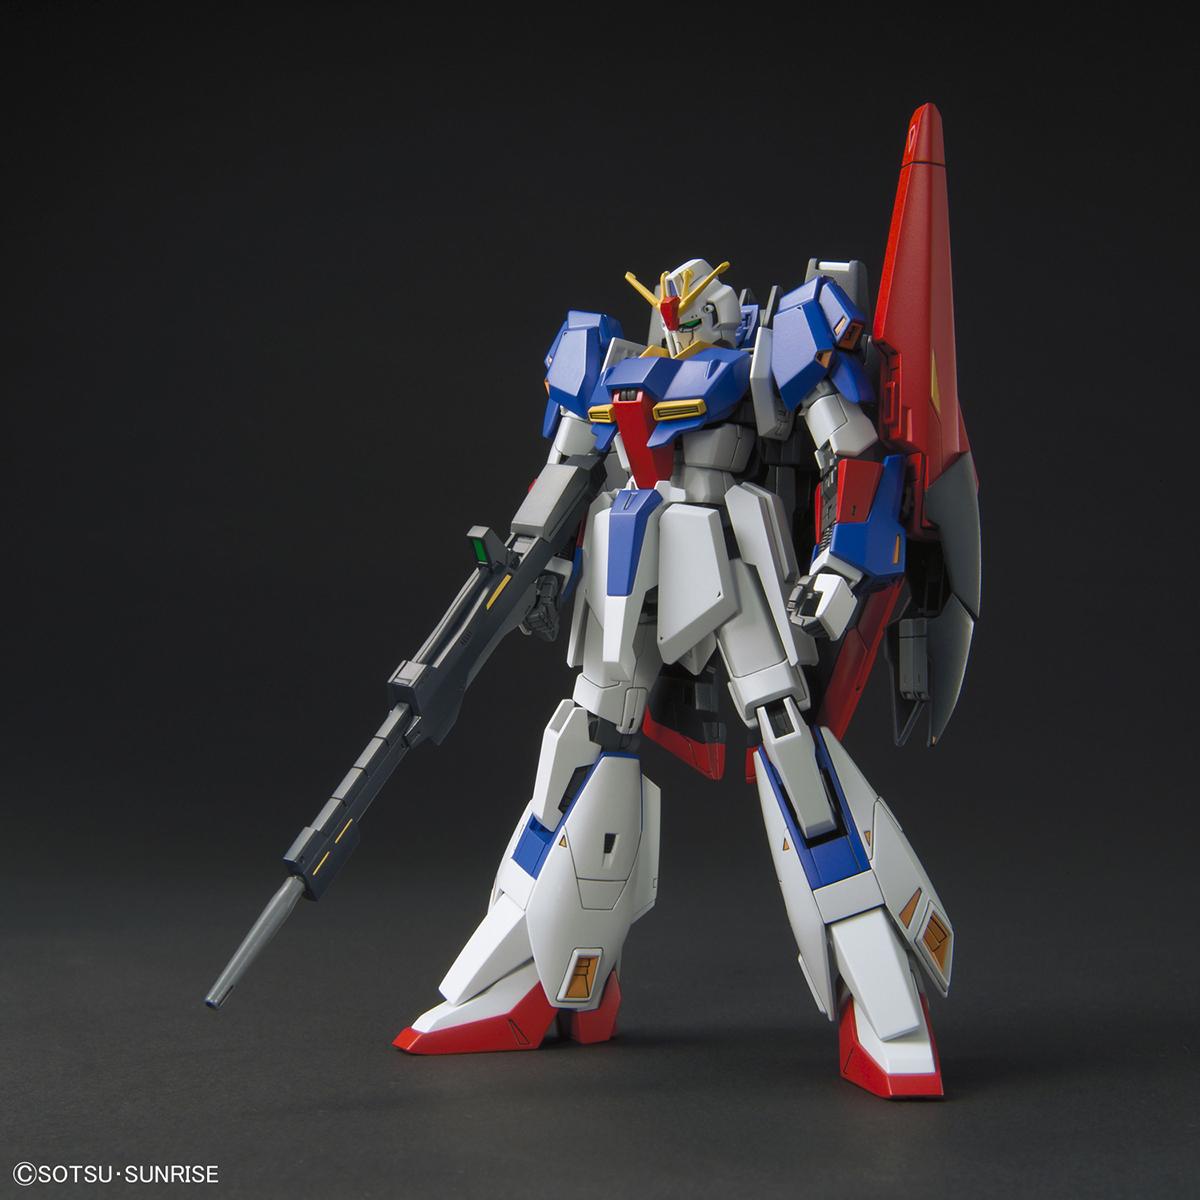 38080HGUC 1/144 MSZ-006 ゼータガンダム [Zeta Gundam] 0215633 5055611 4573102556110